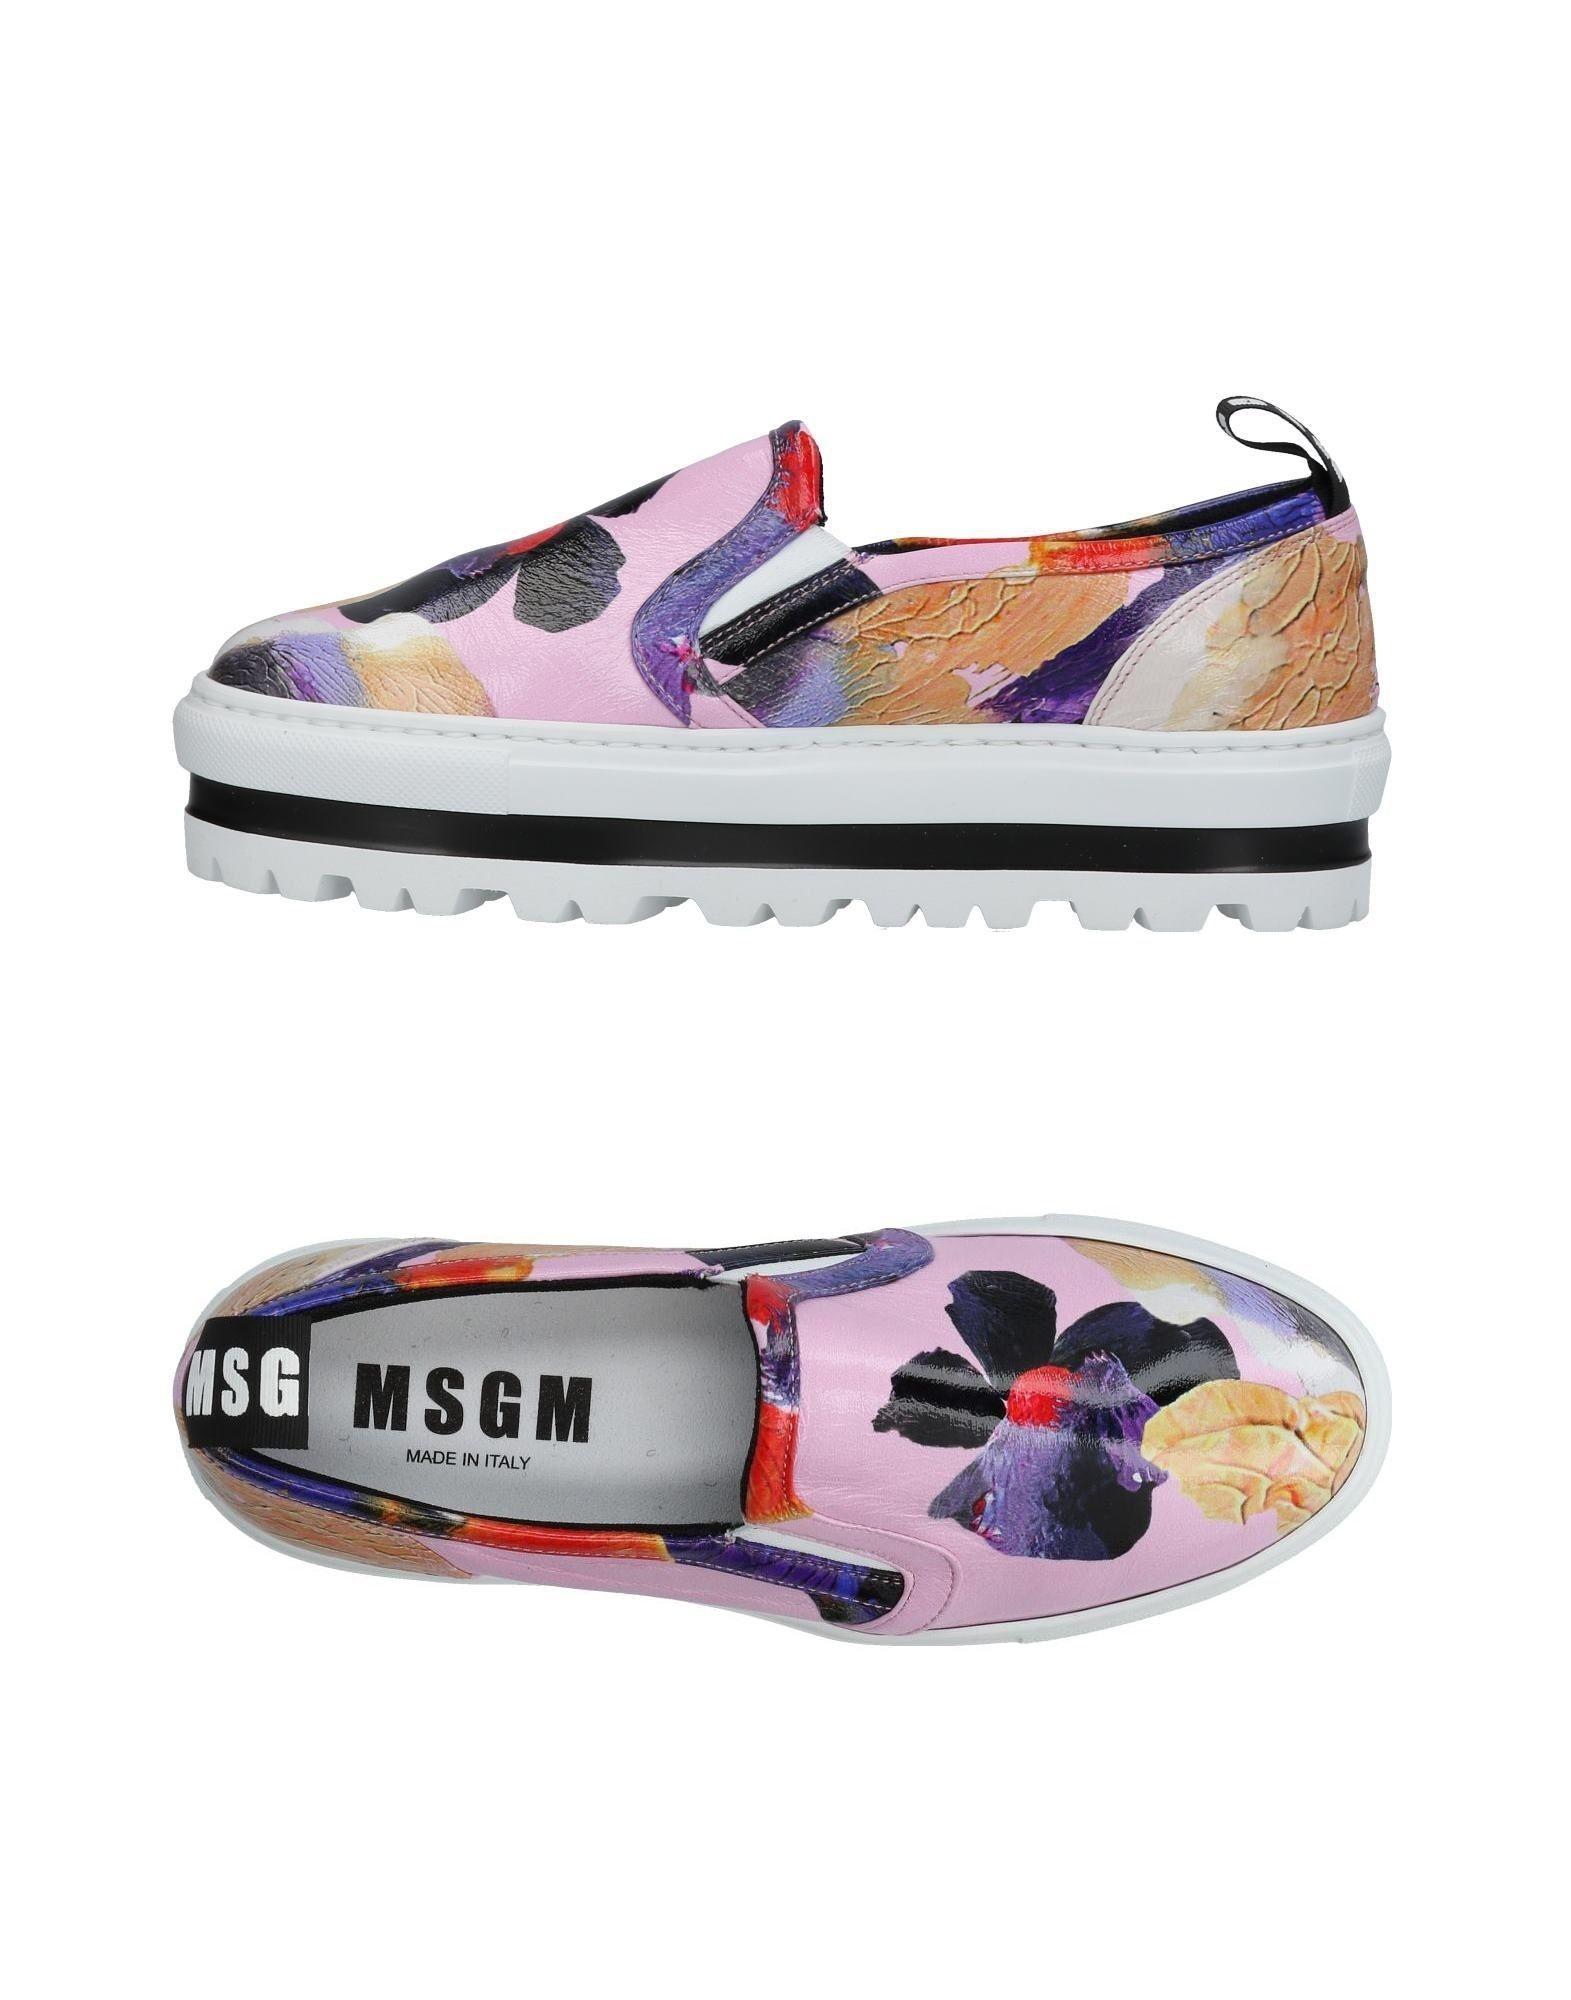 Msgm Sneakers Damen  11419118XKGut aussehende strapazierfähige Schuhe